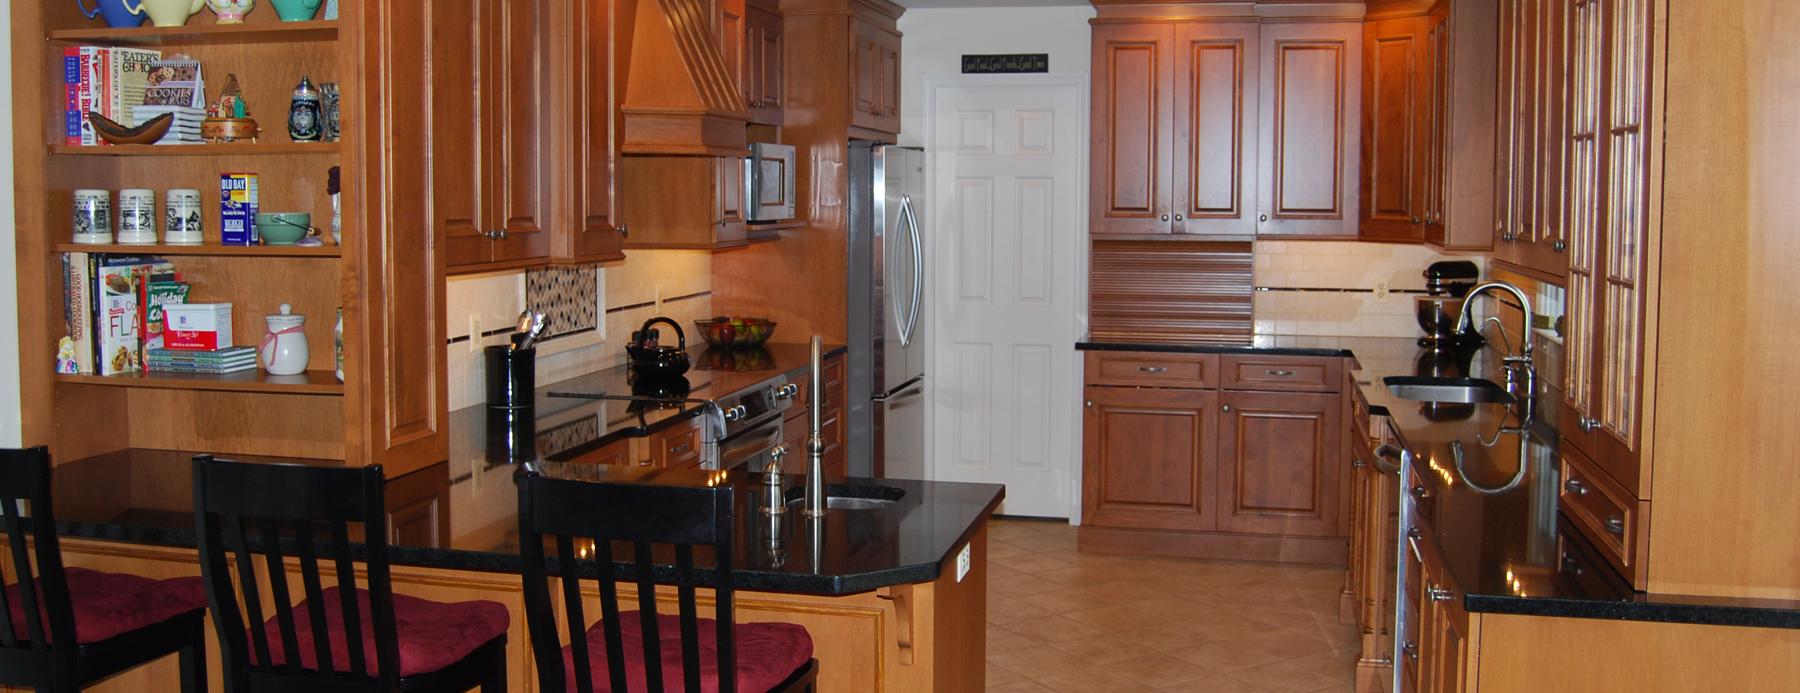 Kitchen-Remodeling-Fallston-Maryland